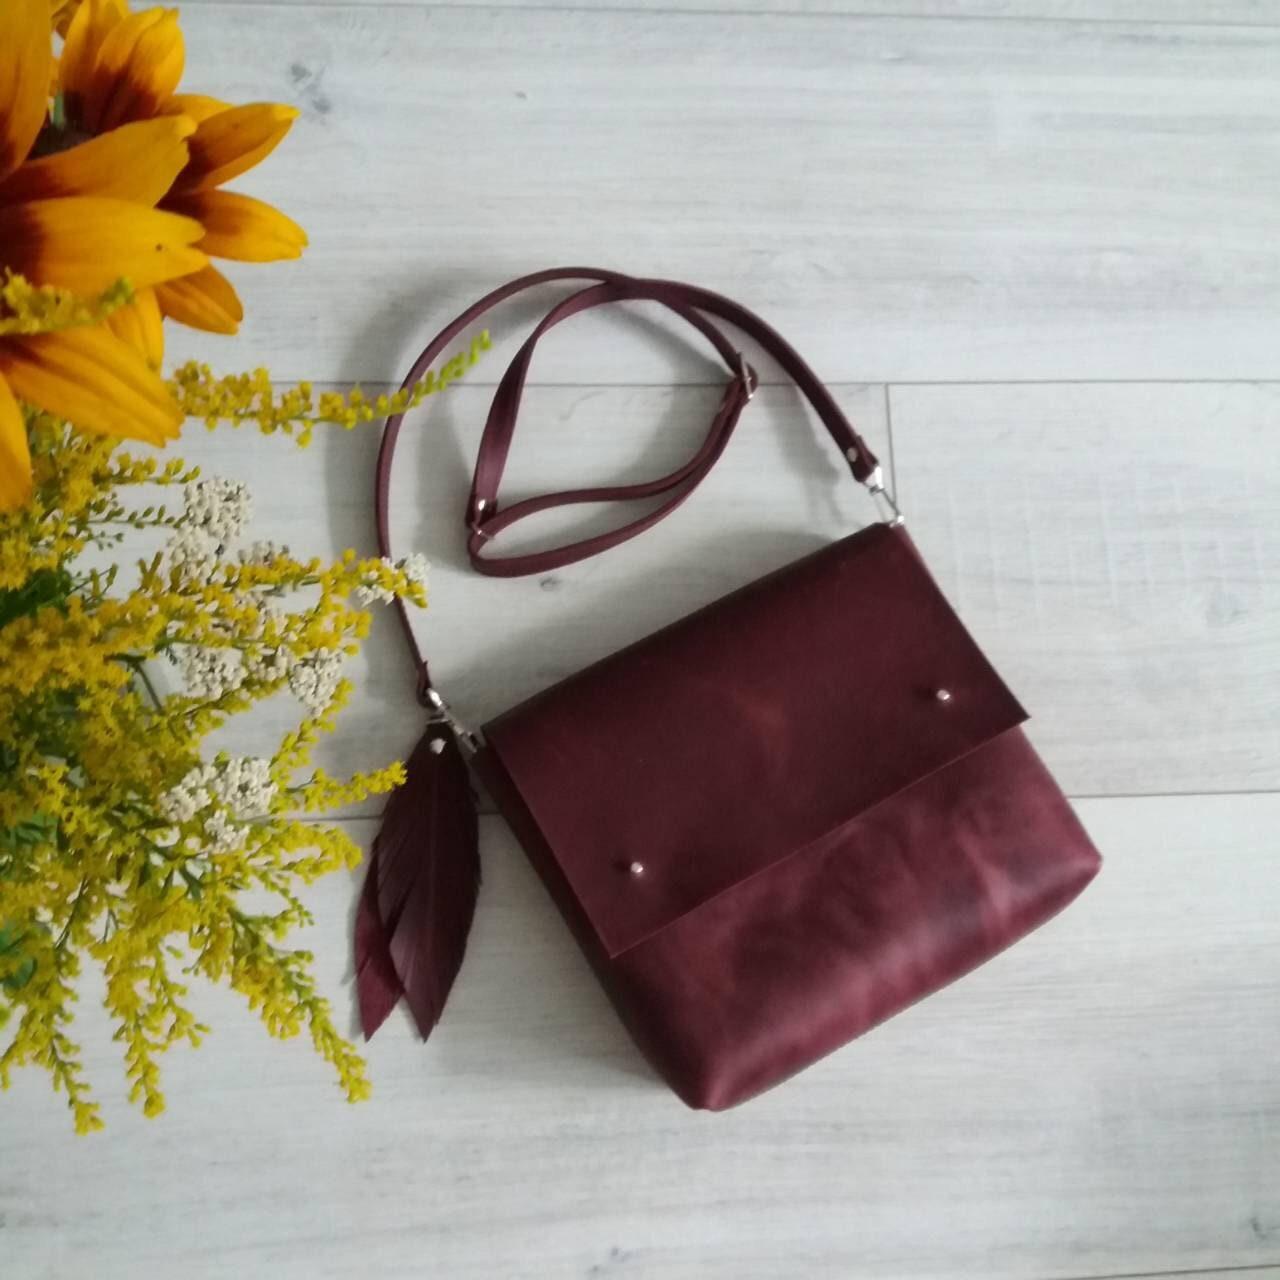 58f16f3fa6 Leather Crossbody Bag Handmade Burgundy Leather Crossbody Bag